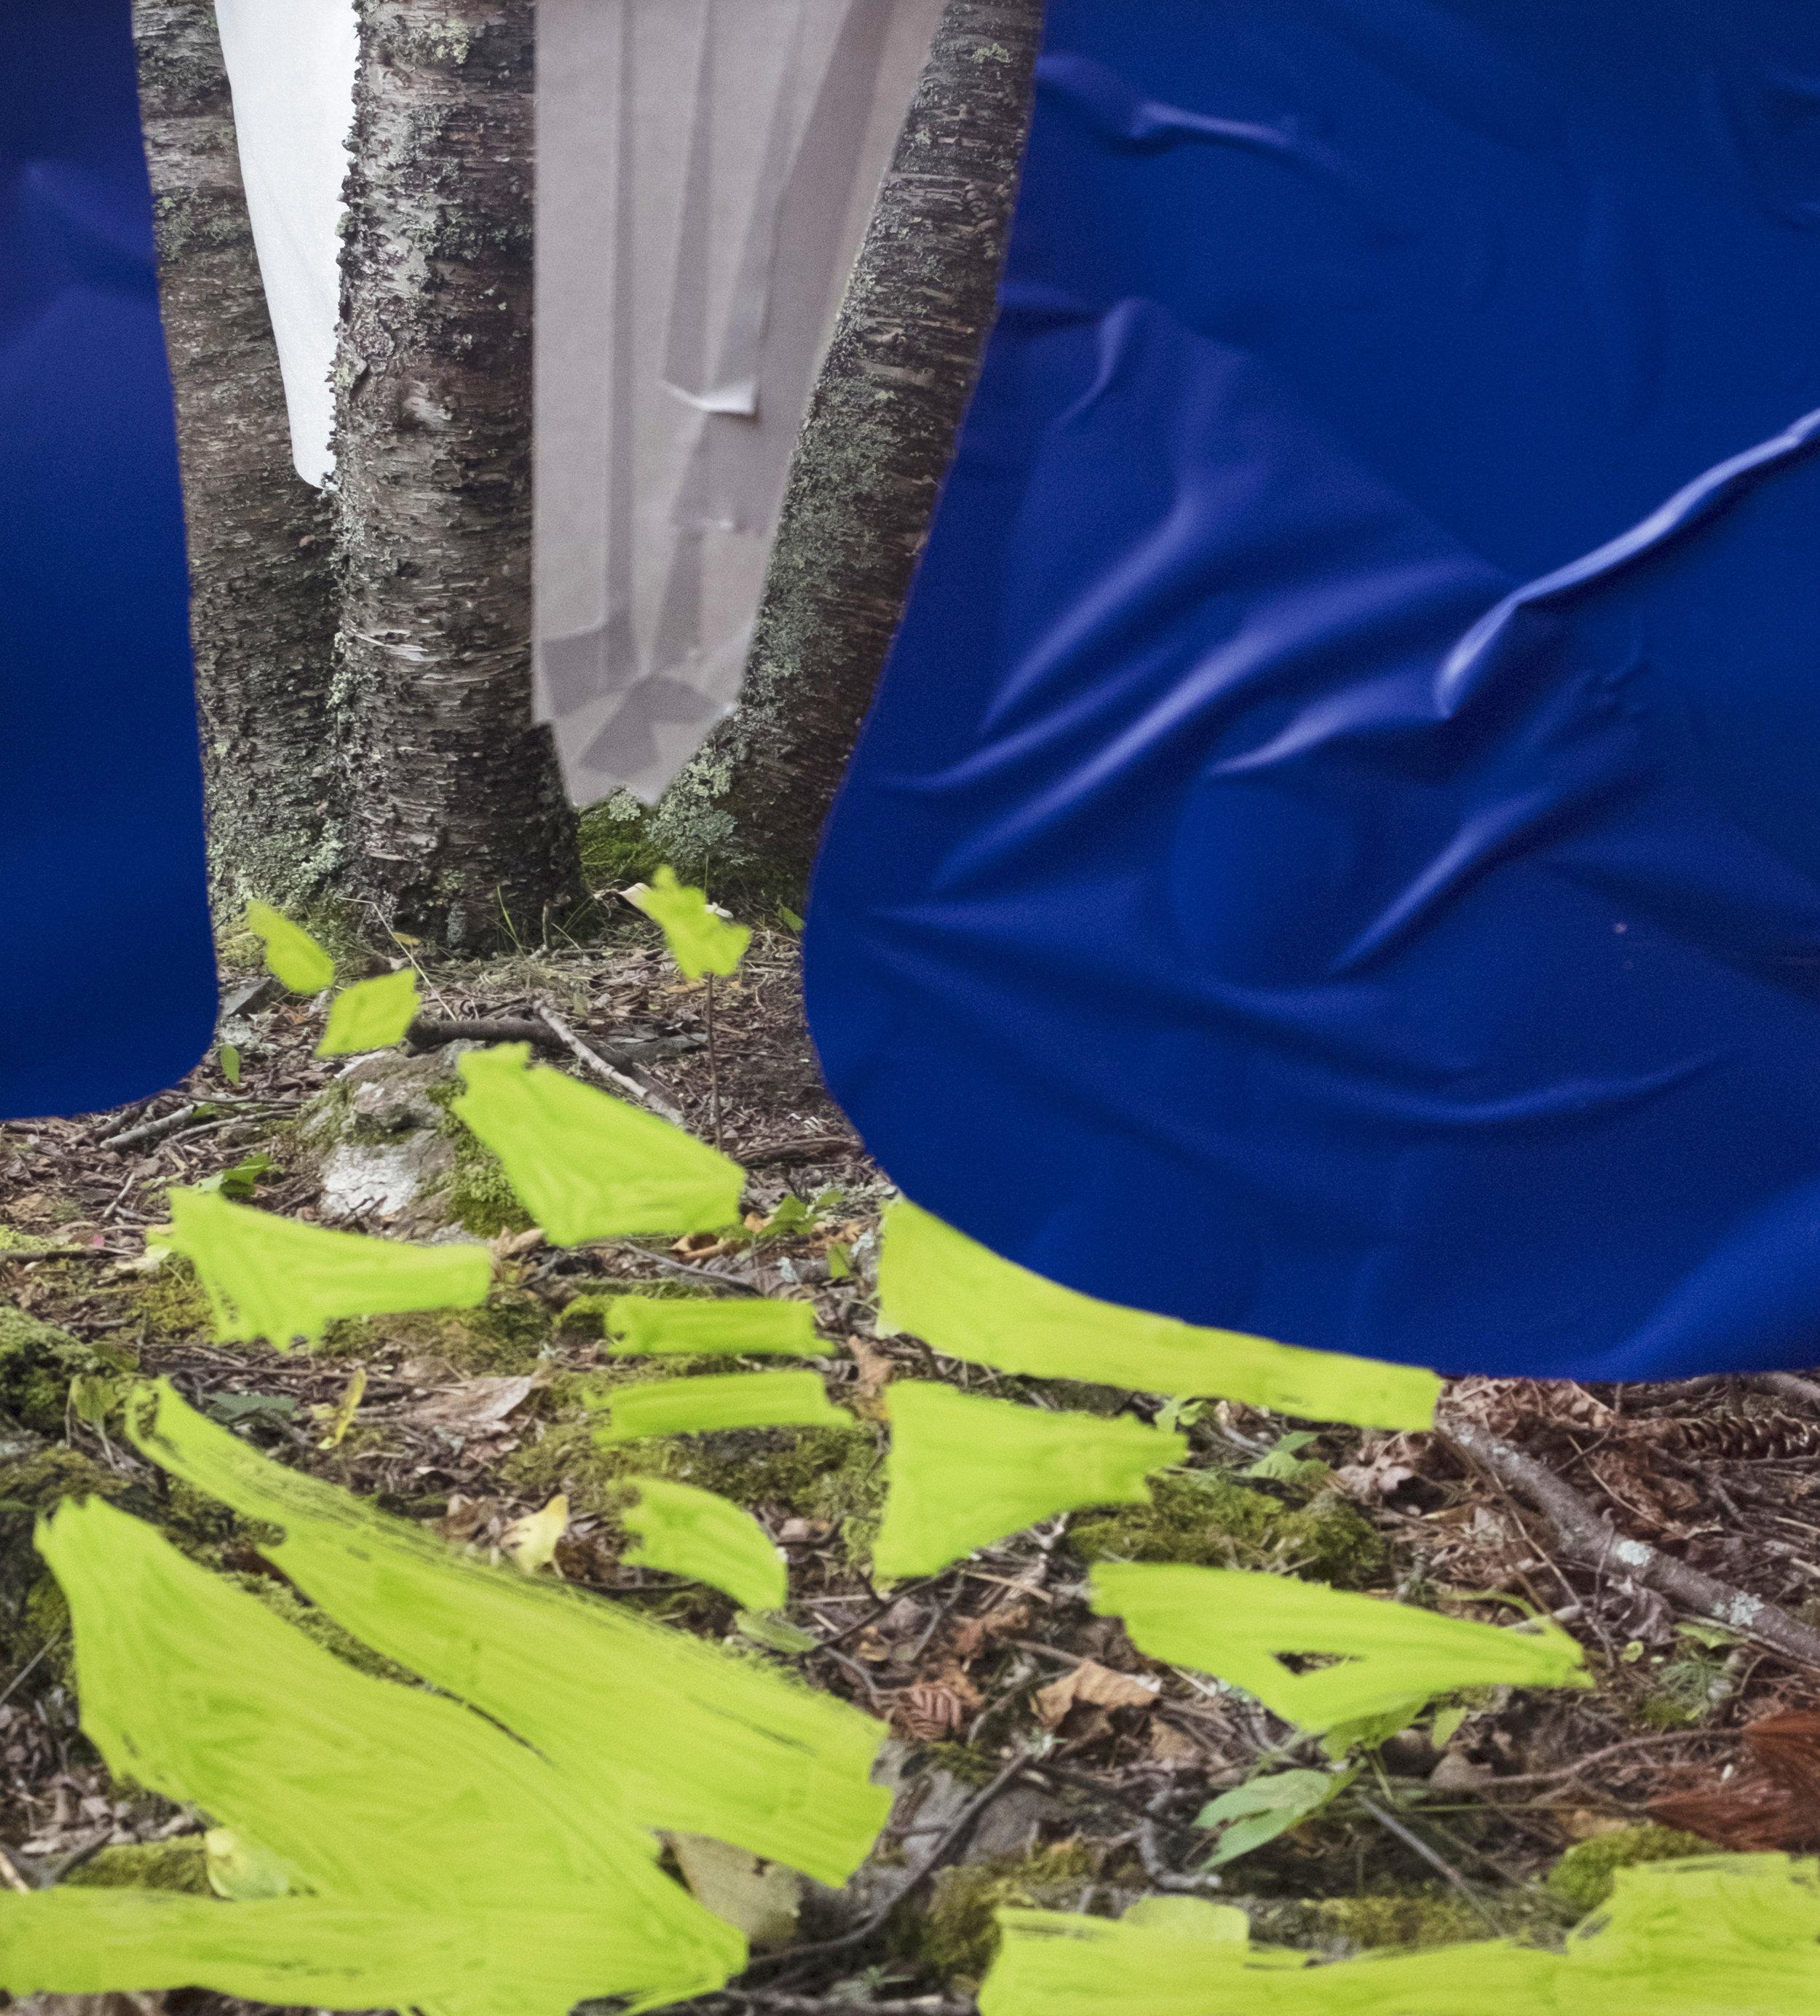 09.06.16 Tofte Lake (Triplet Trees)